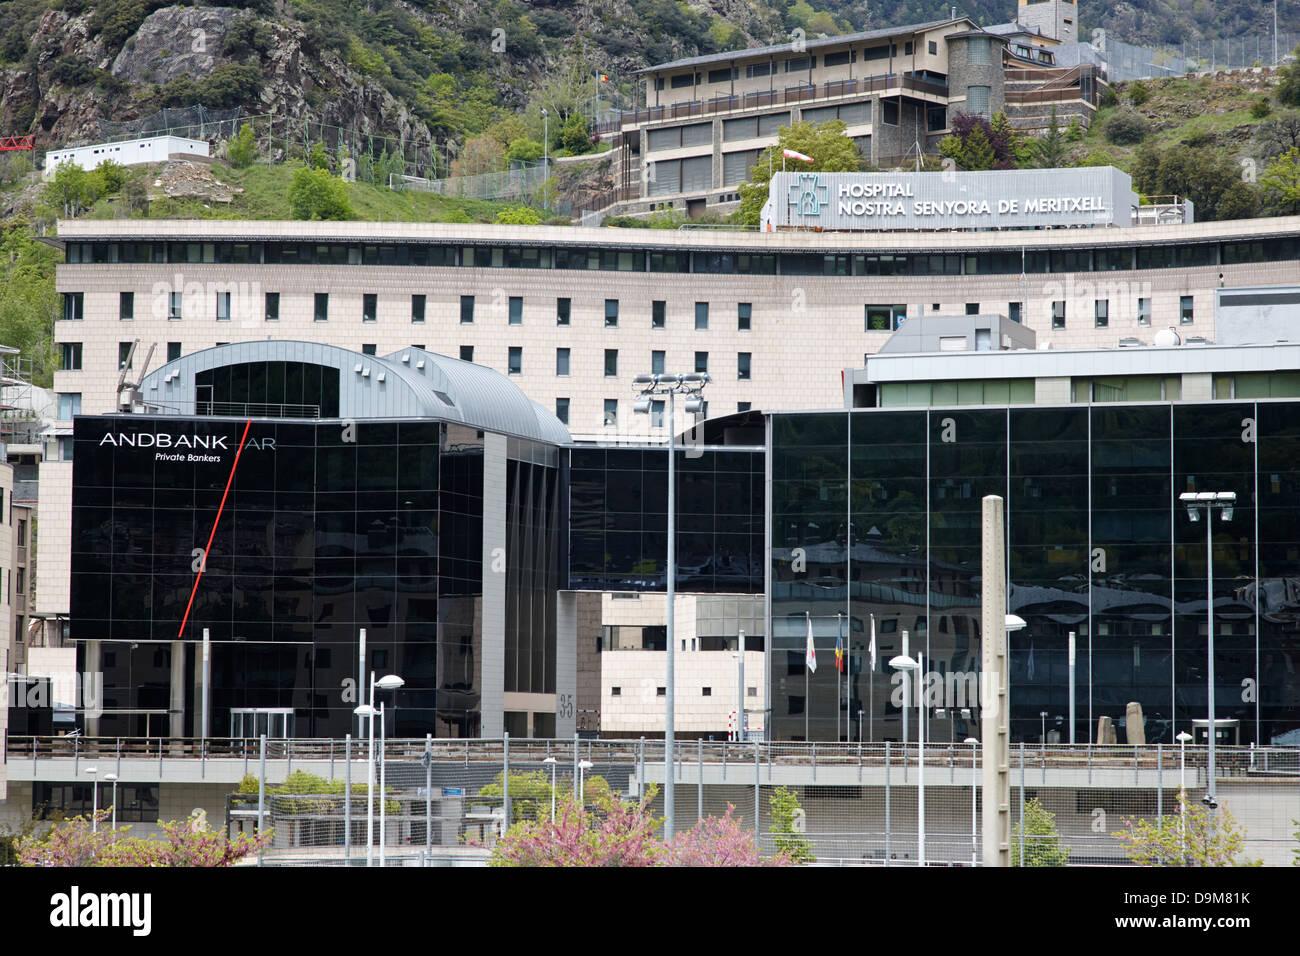 view over andorran including andbank and hospital nostra senyora de meritxell andorra la vella andorra Stock Photo